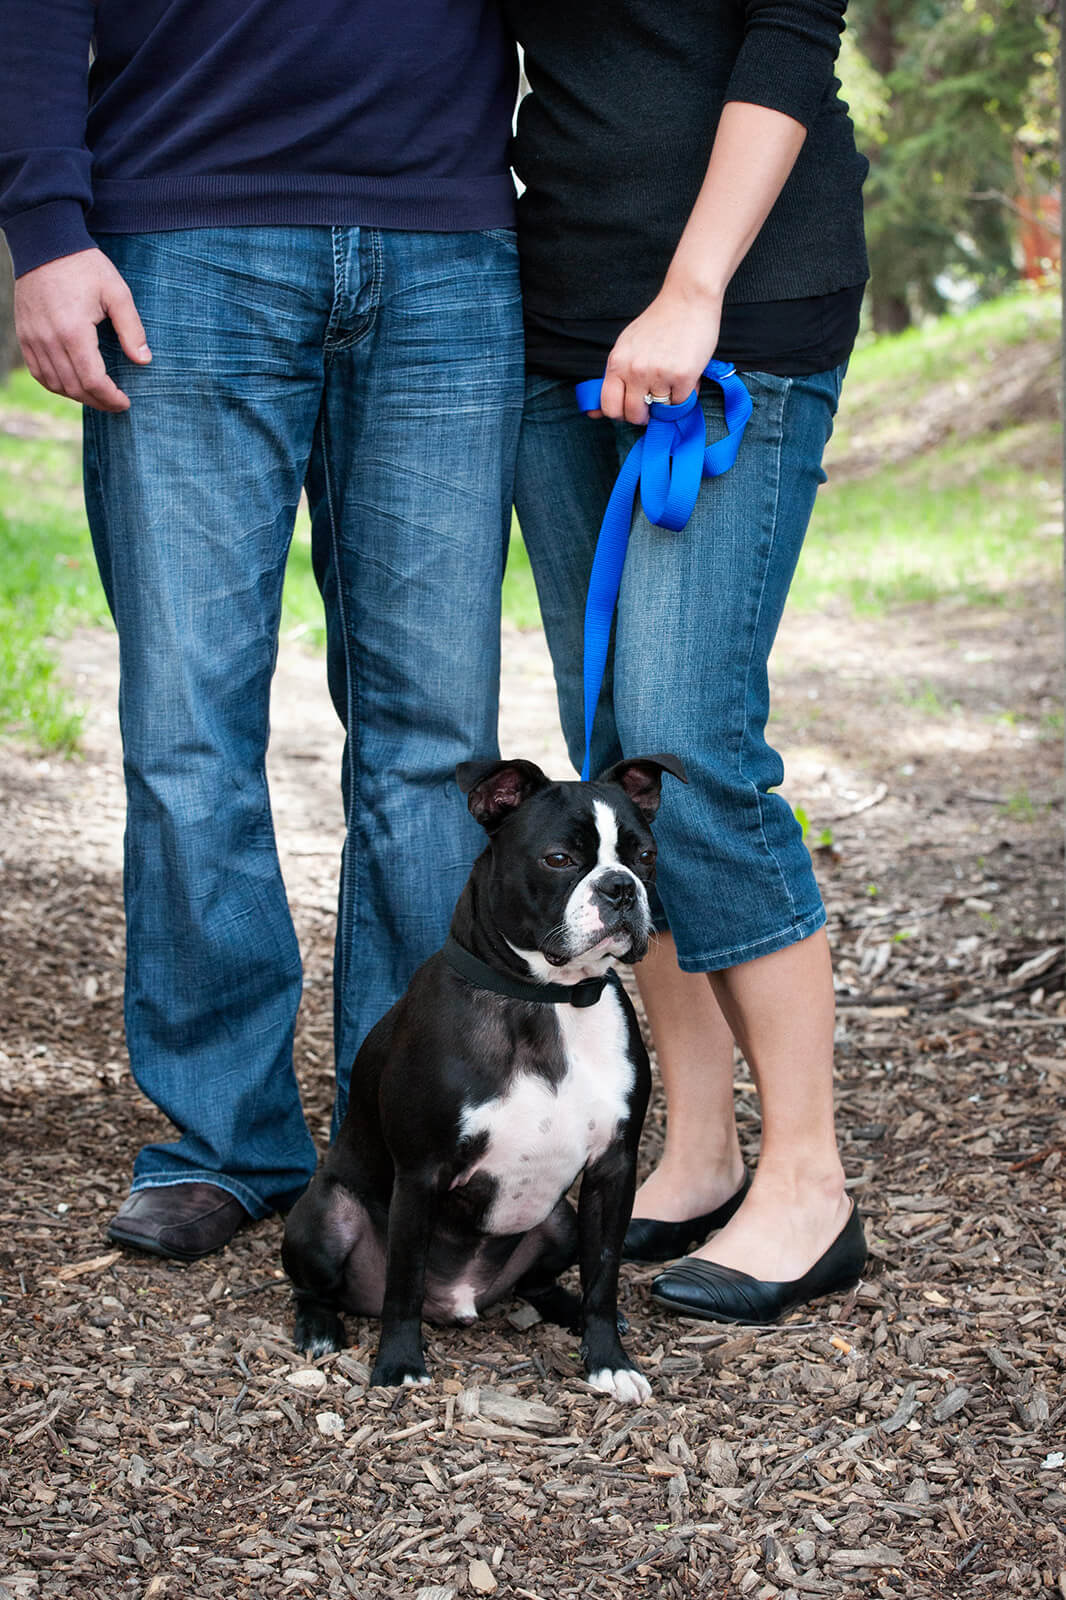 Regina Engagement Photographer - Adam & Vicki - Engagement with Dog